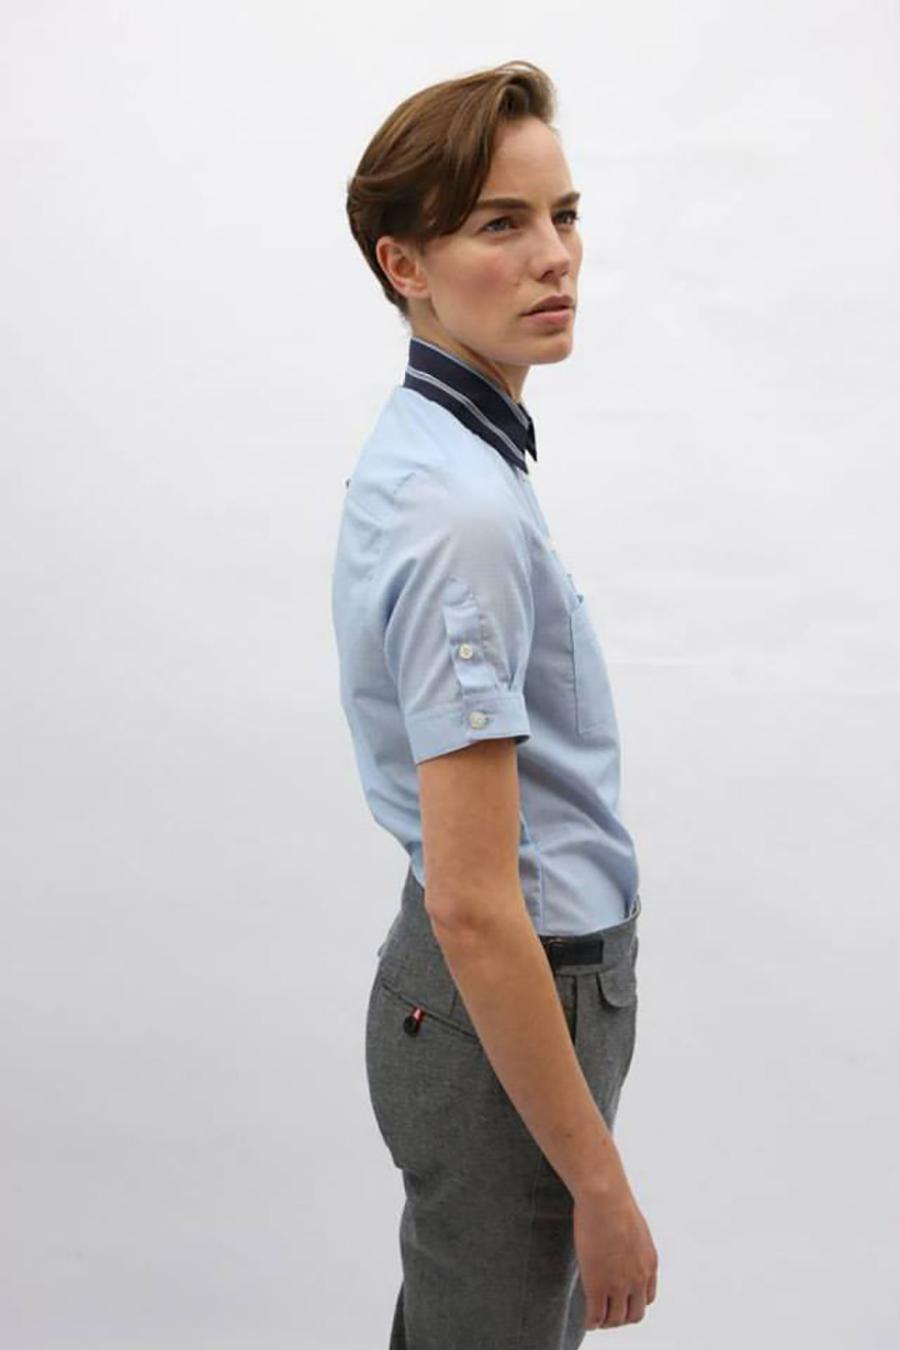 blue sports shirt.jpg